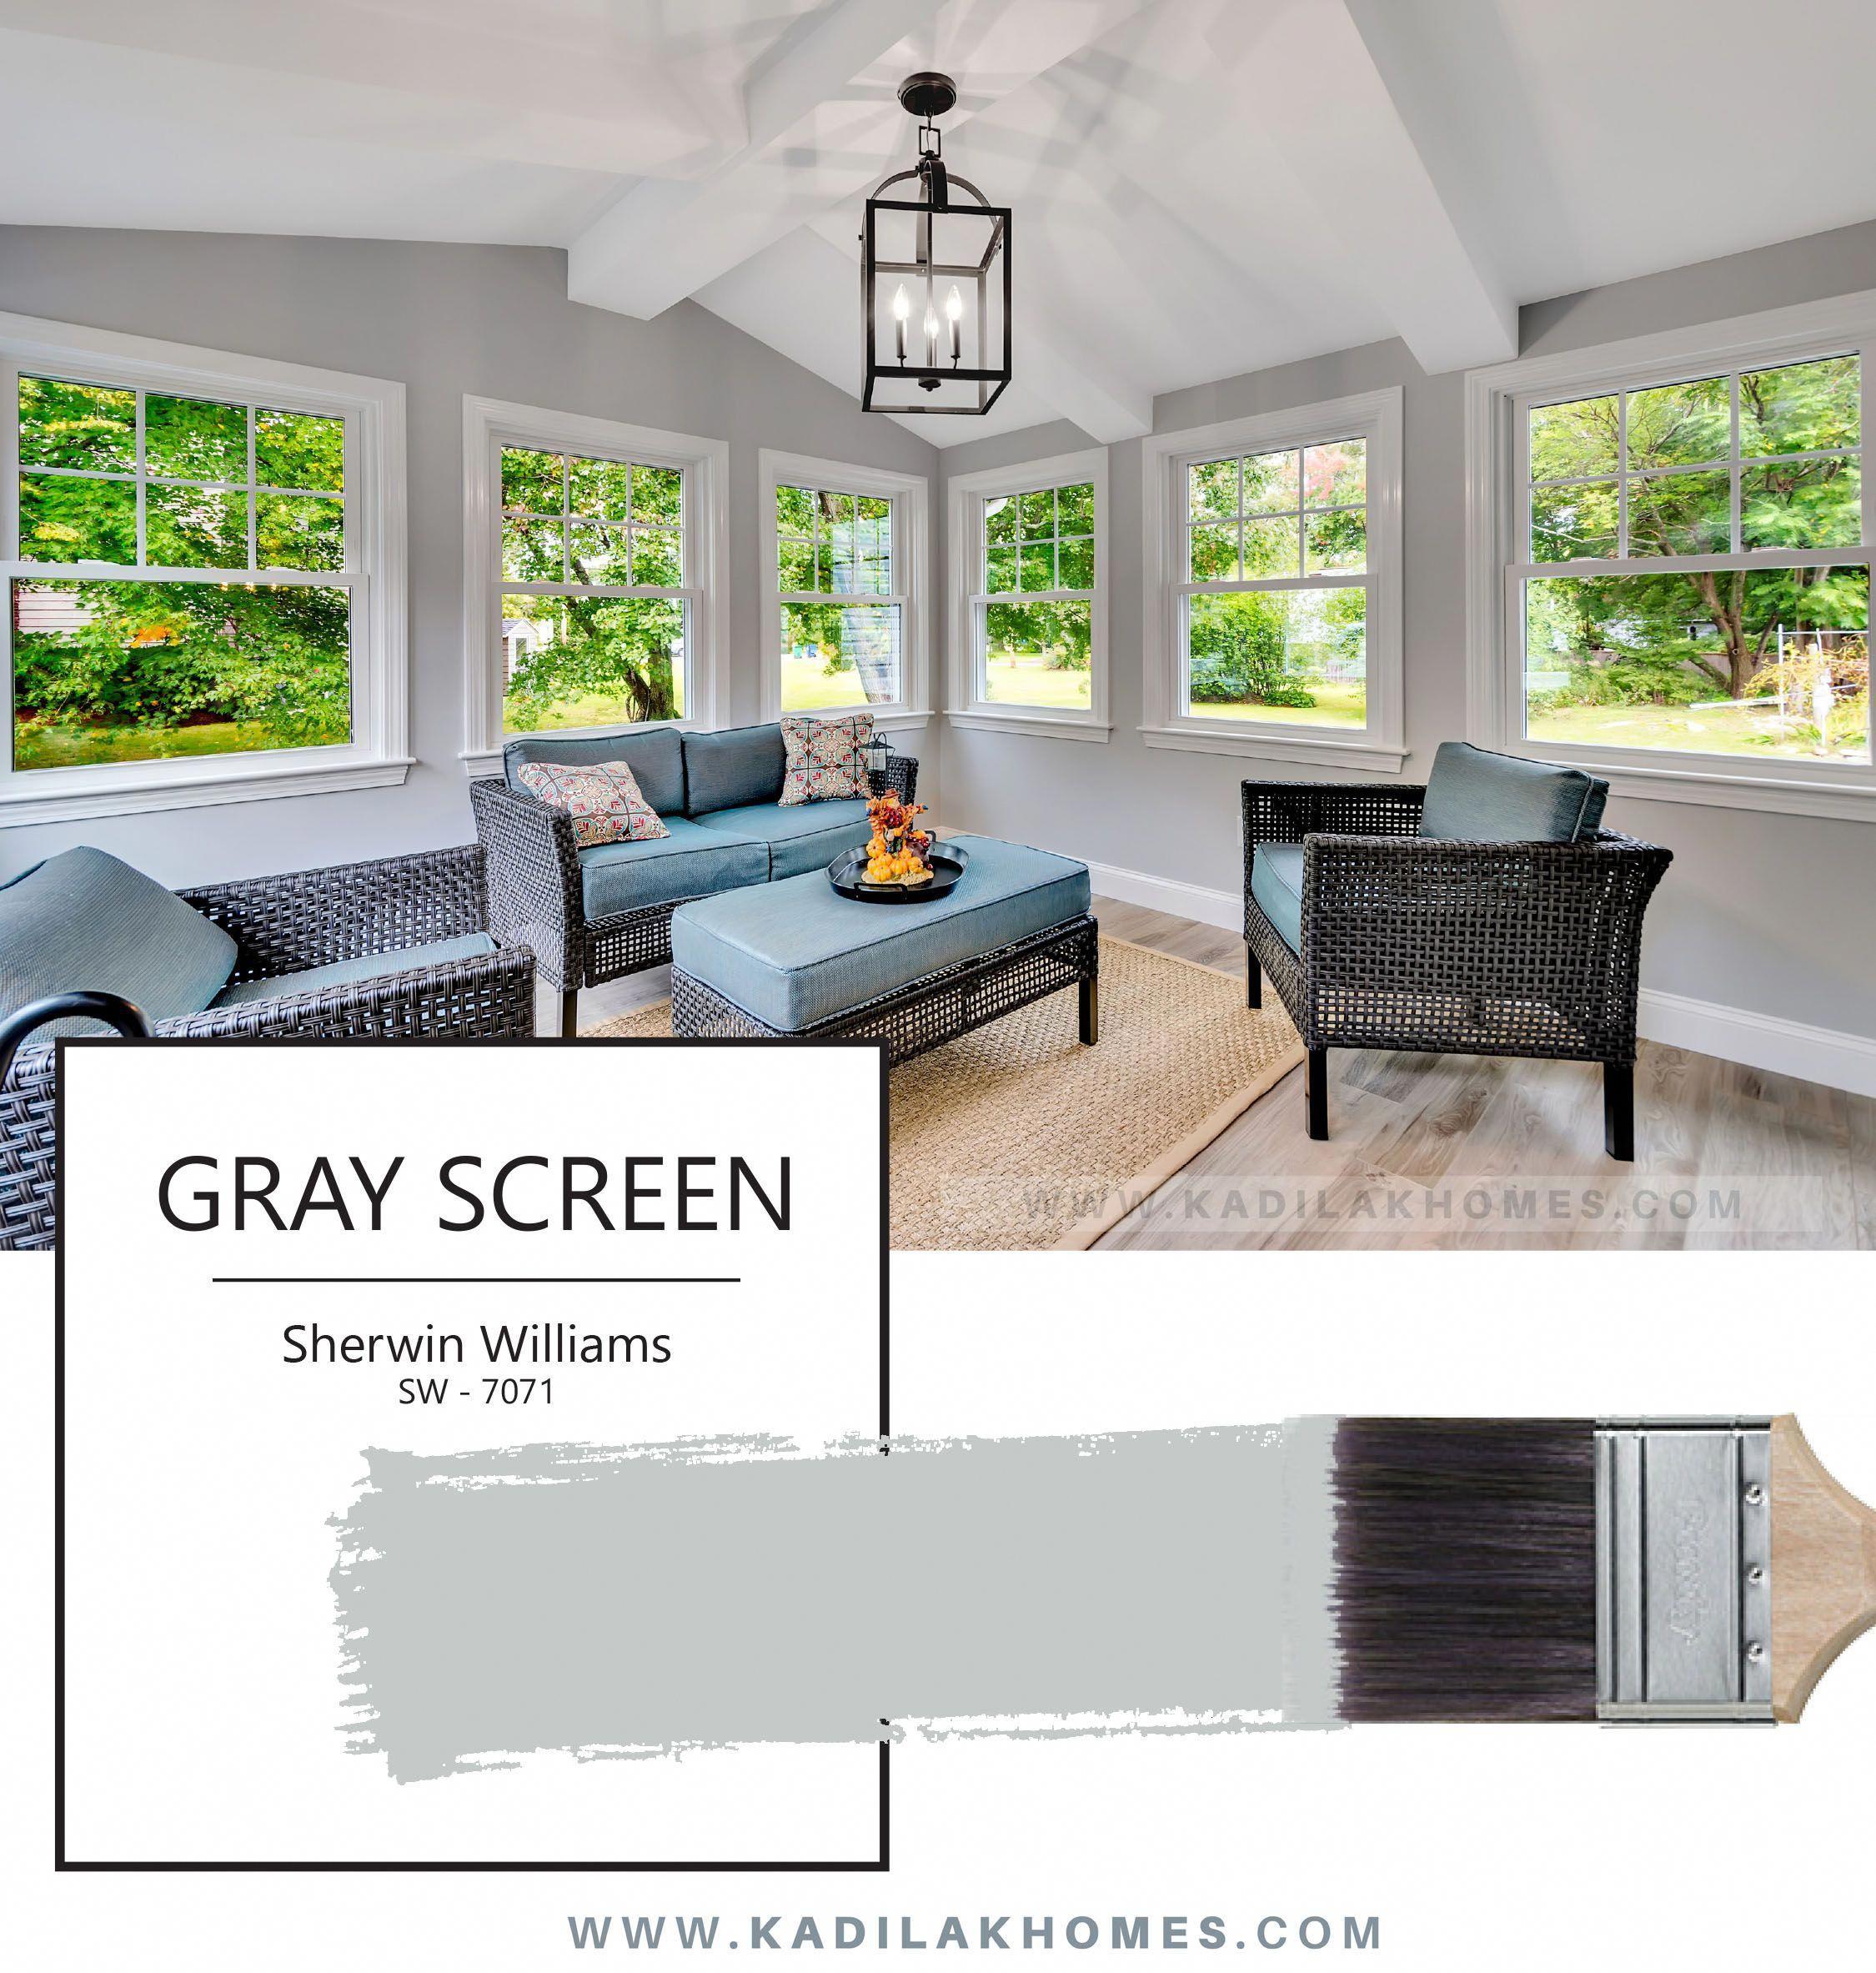 Sw Gray Screen Undertones: Gray Screen By Sherwin Williams SW